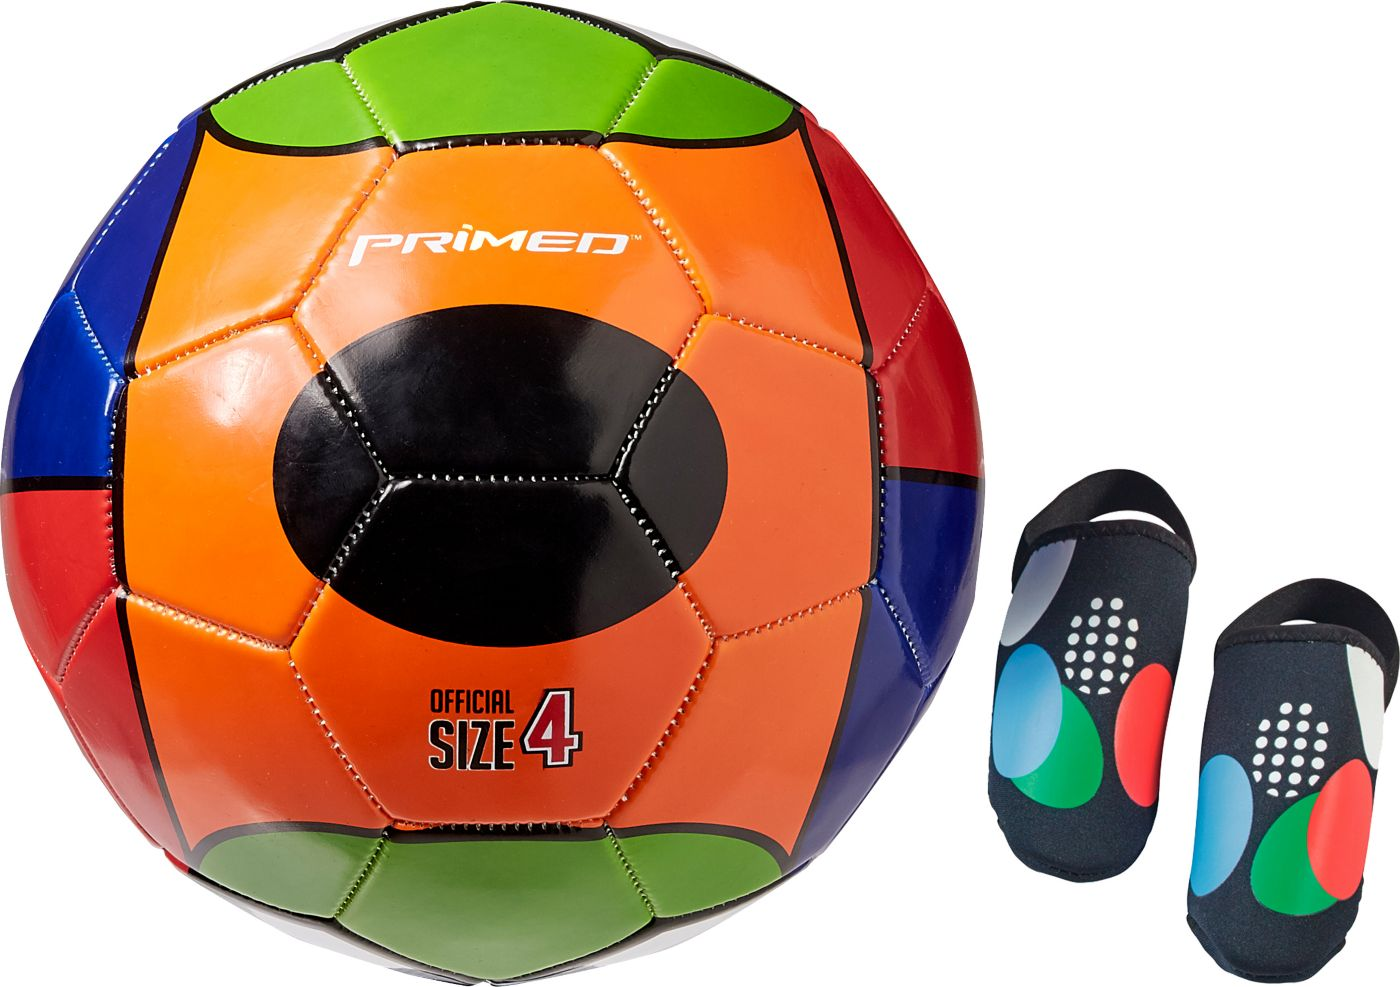 PRIMED Soccer Kick Trainer